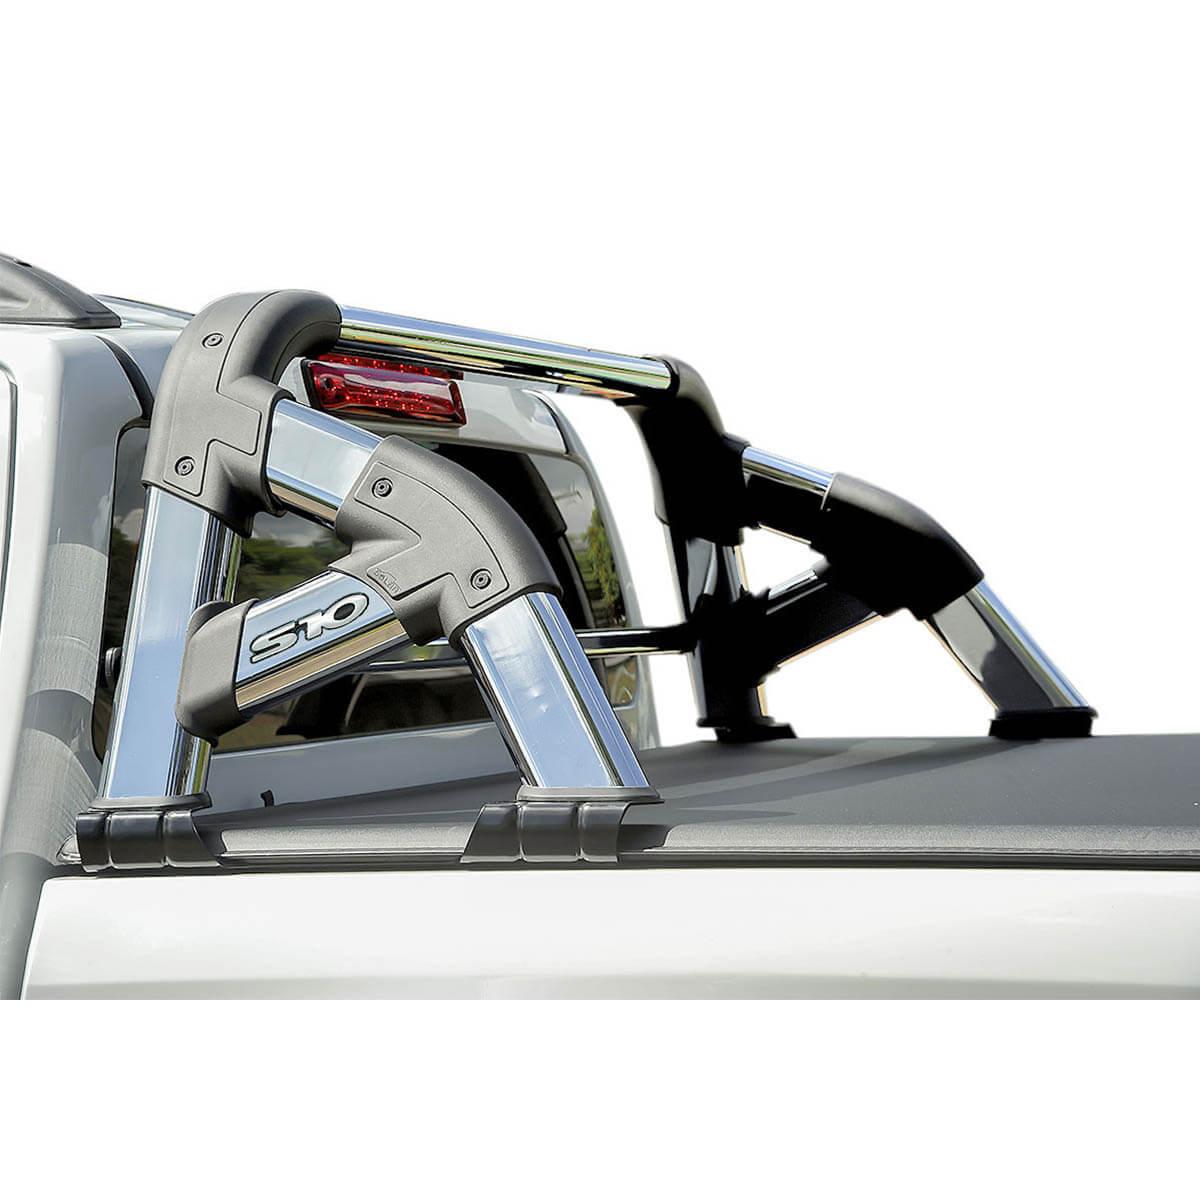 Santo antônio cromado Solar Exclusive Nova S10 cabine dupla 2012 a 2018 com barra de vidro cromada